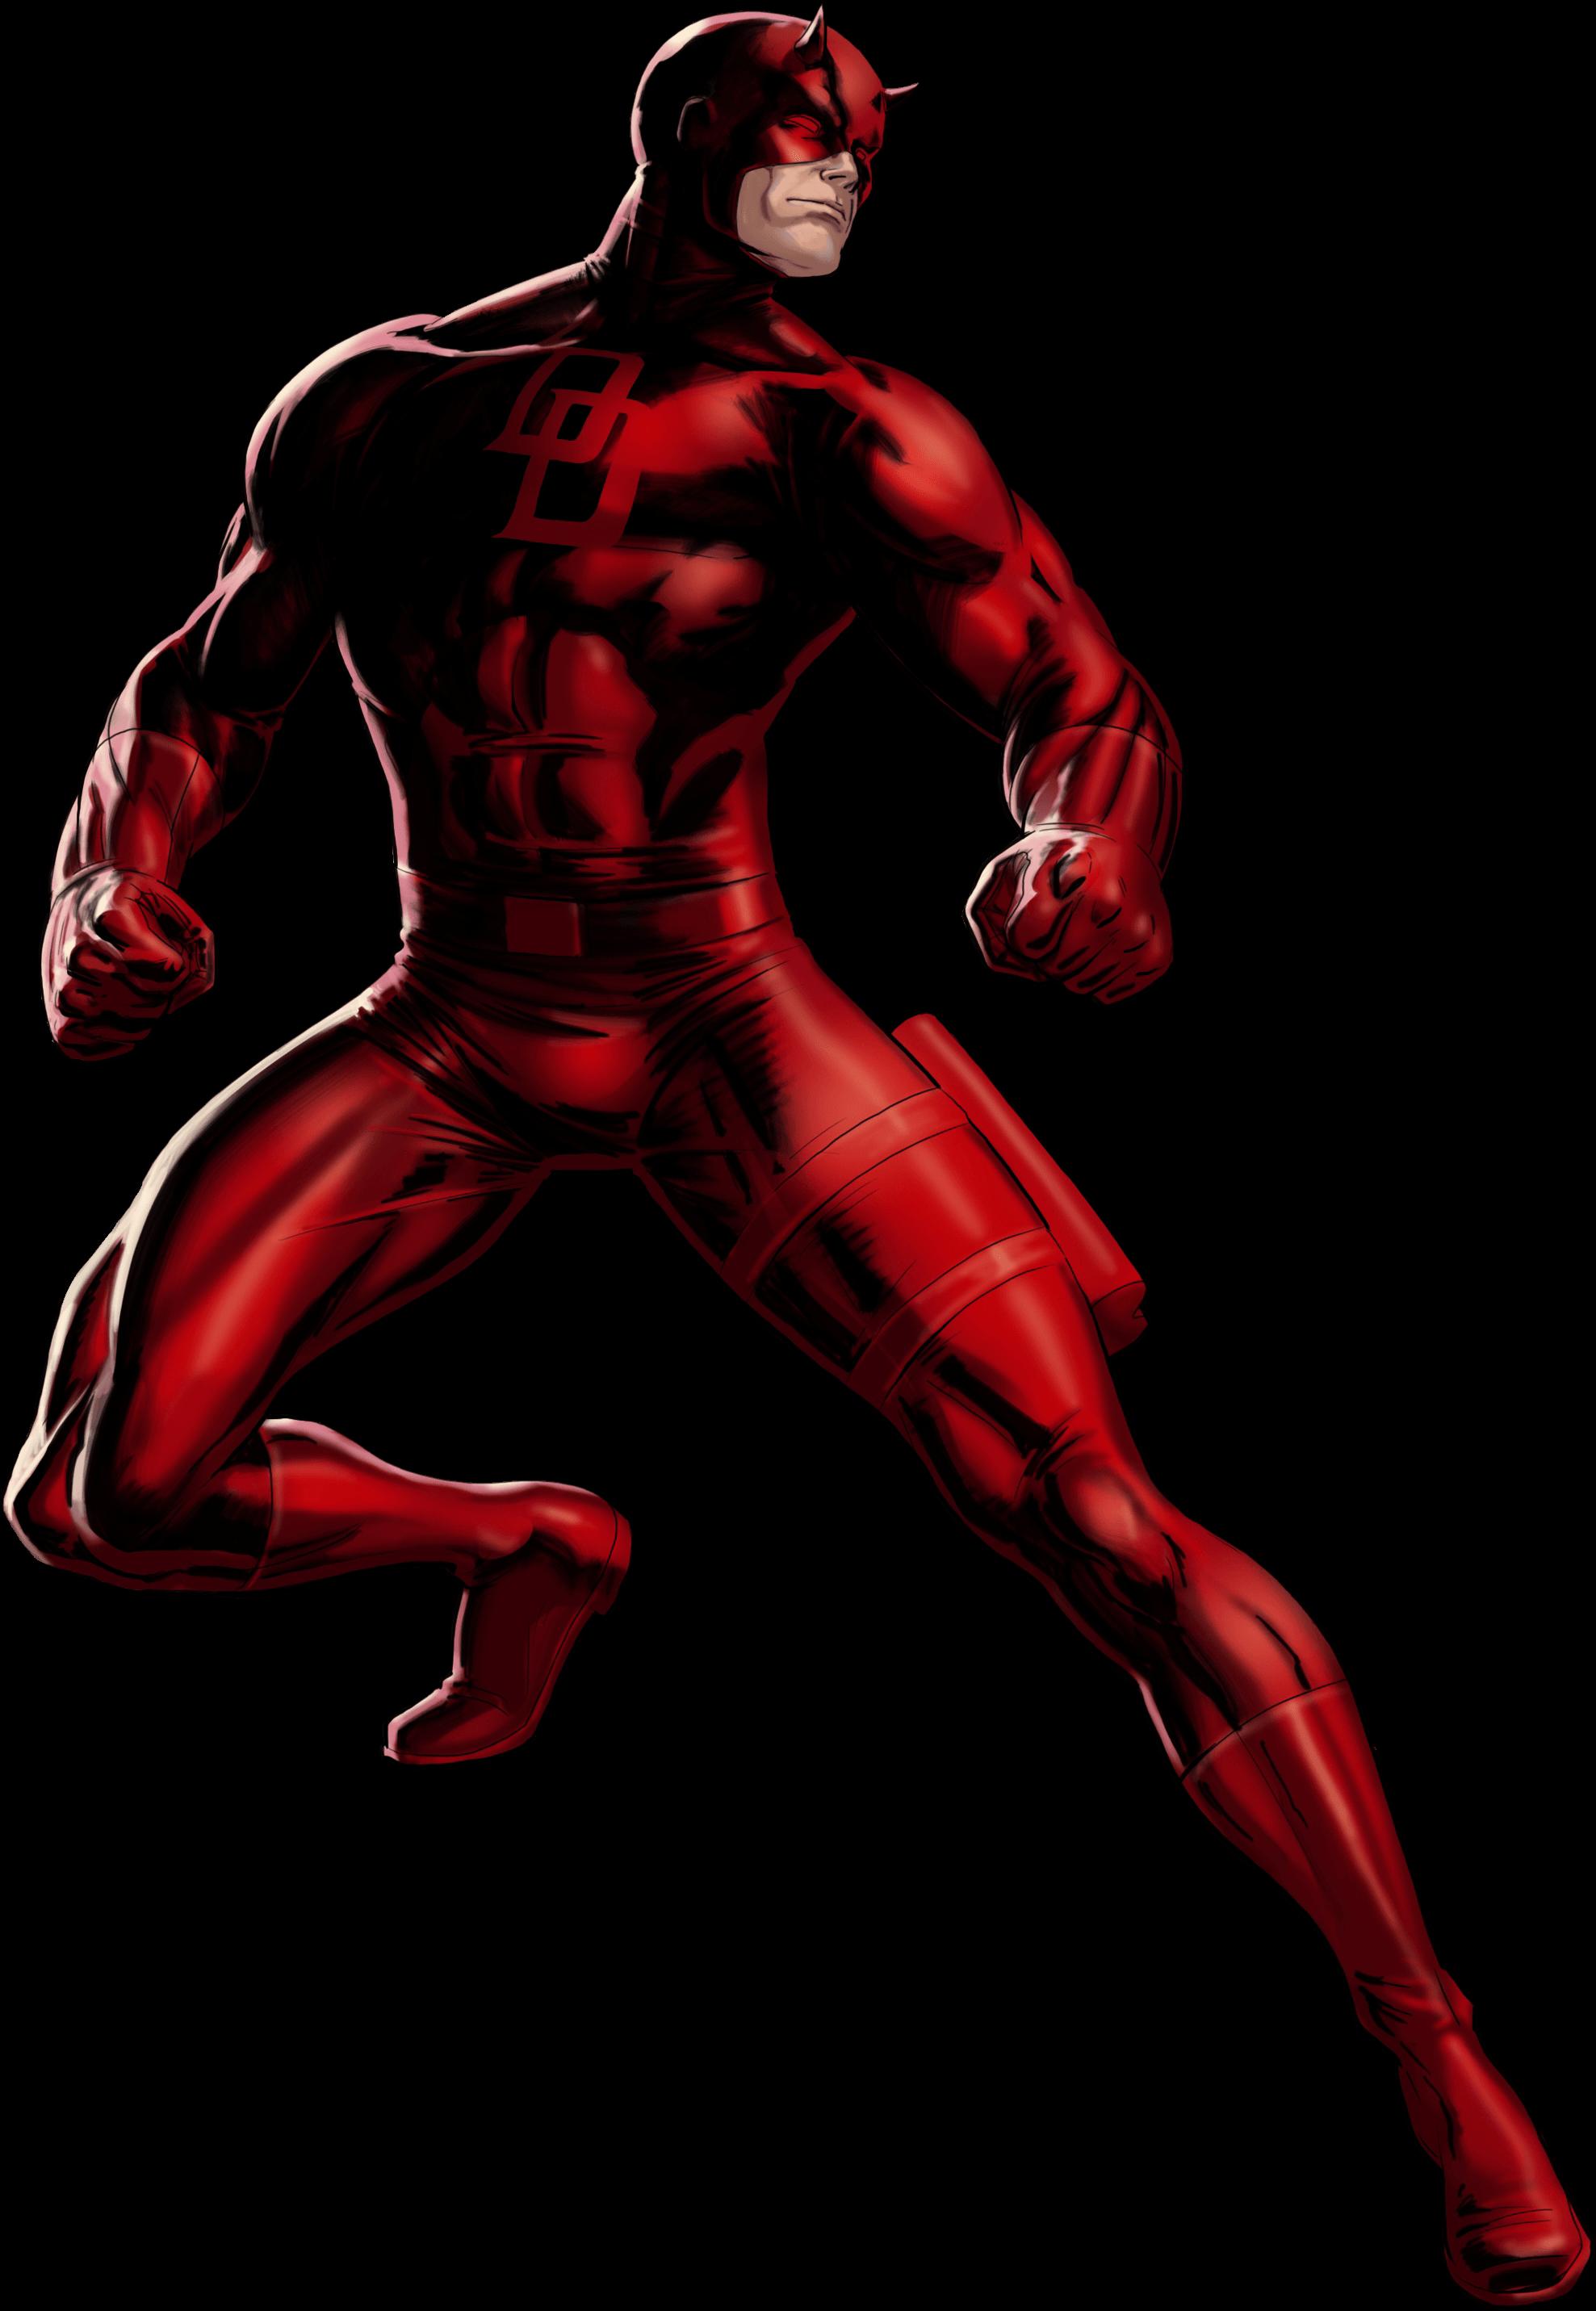 png library download Daredevil transparent. Png images stickpng standing